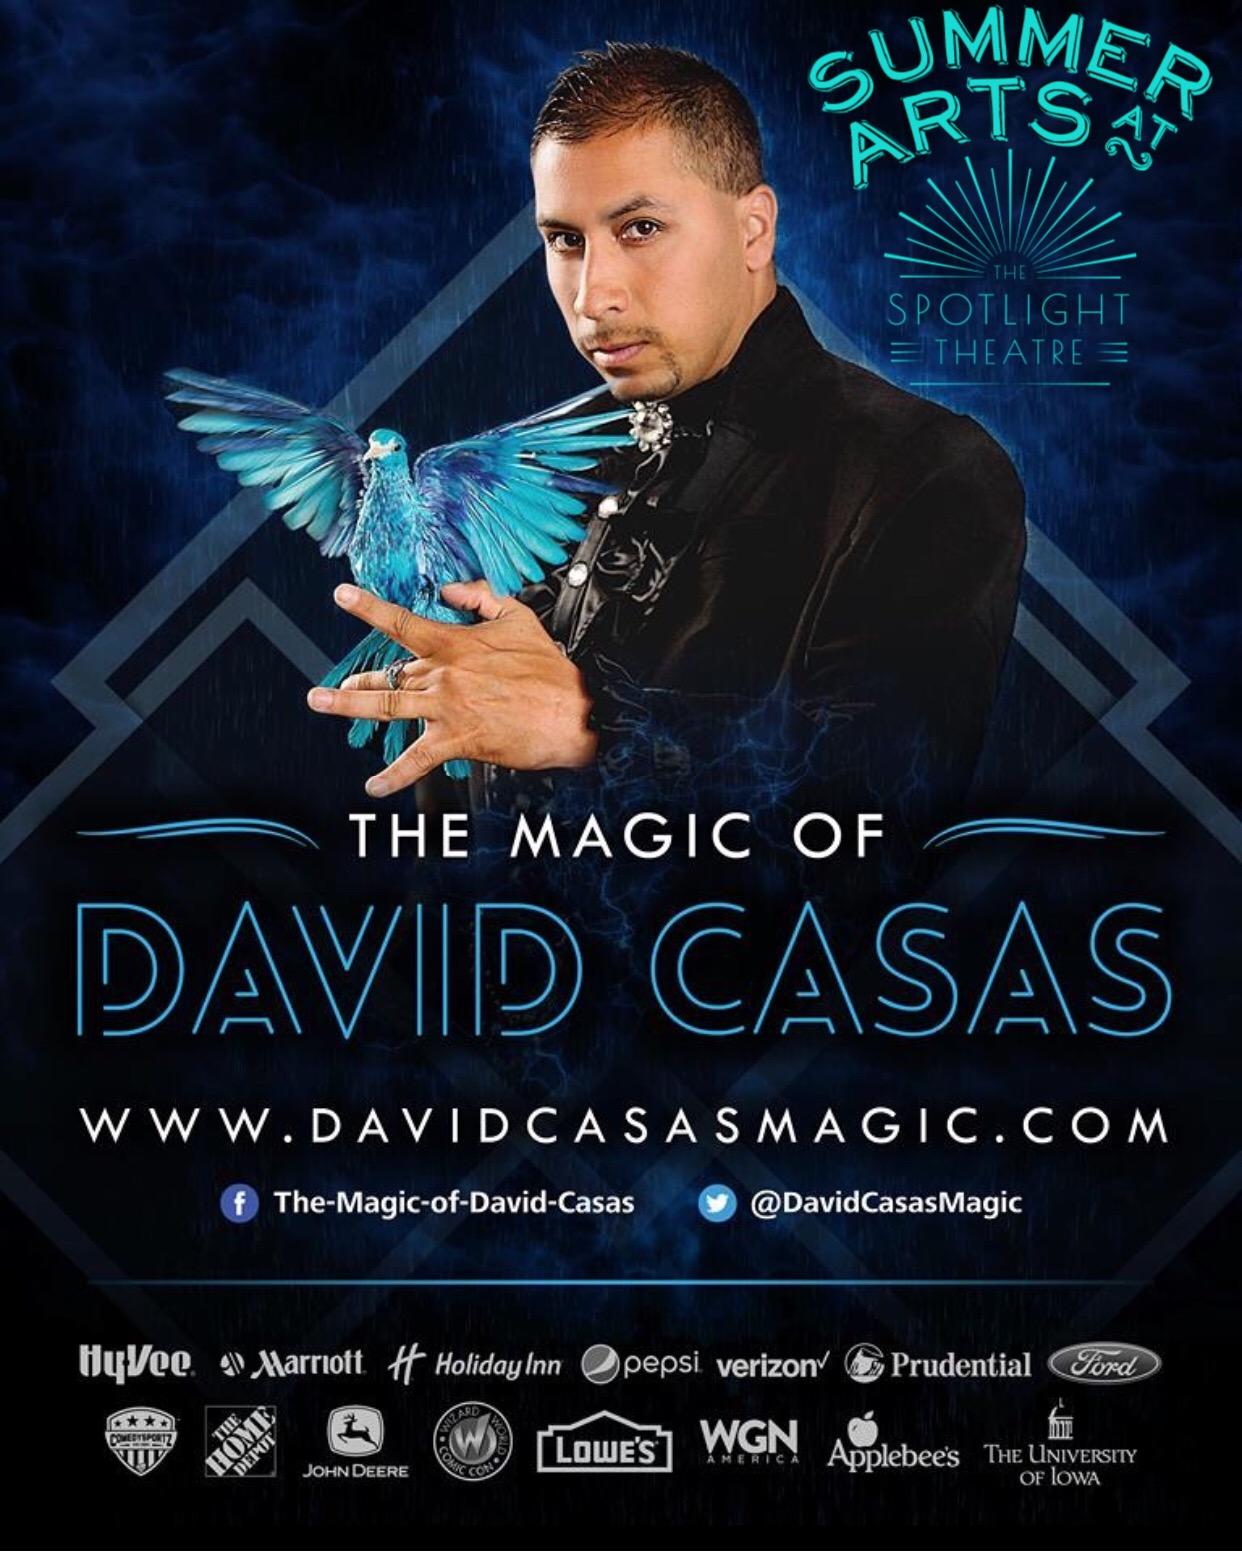 David Casas Magic Camp - July 8th - 12th